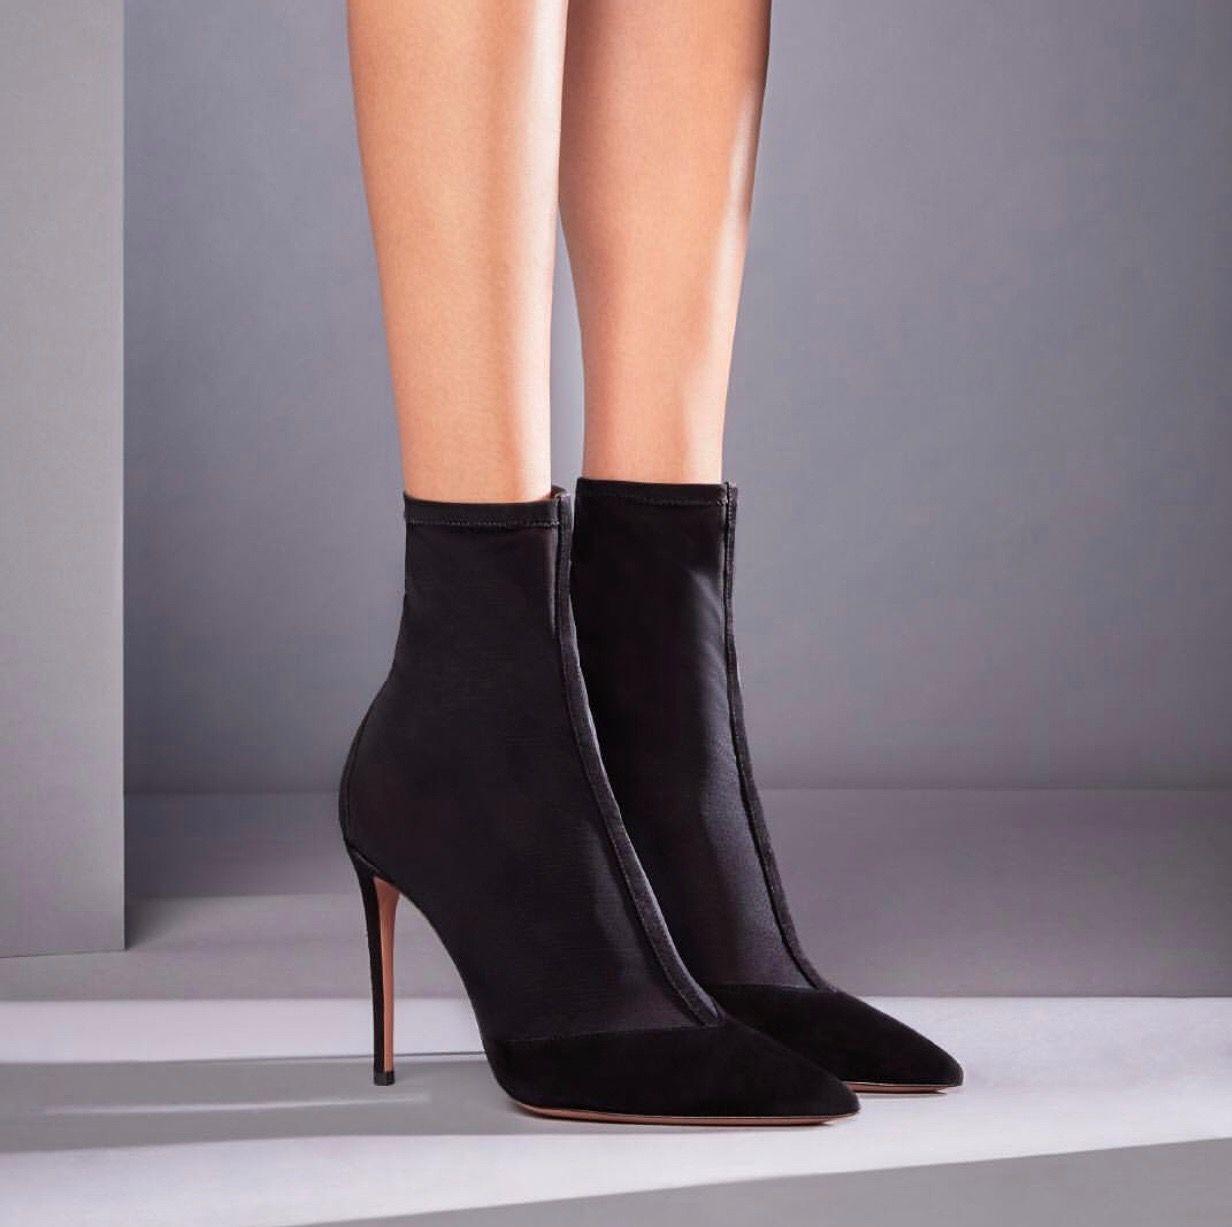 Aquazzura Hot Stuff Booties Chaussures Chaussures Chaussures Chaussuresaddict sandals 4d3f7f